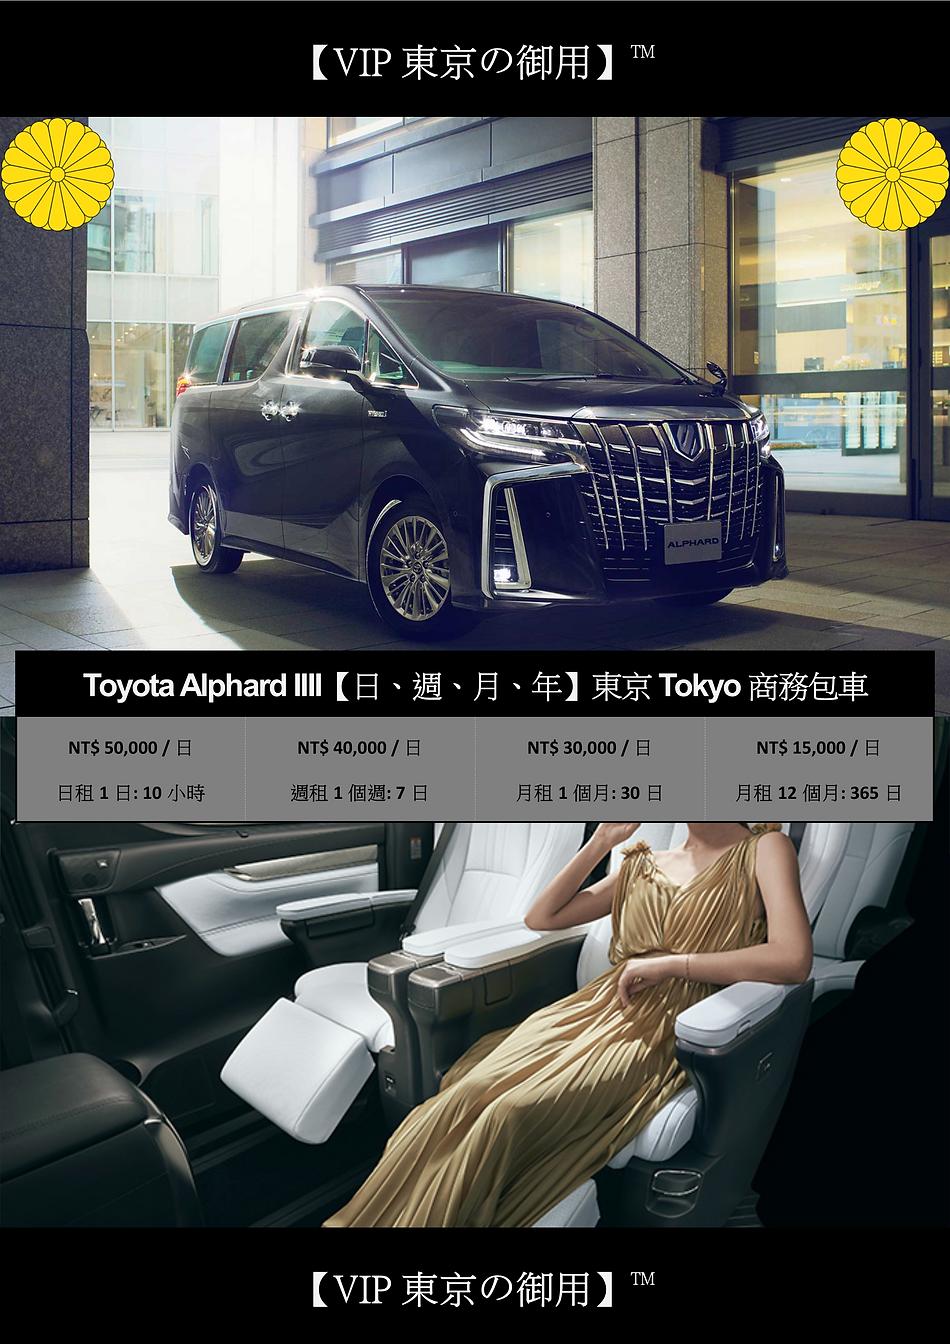 VIP東京の御用 TOYOTA ALPHARD IIII 商務包車